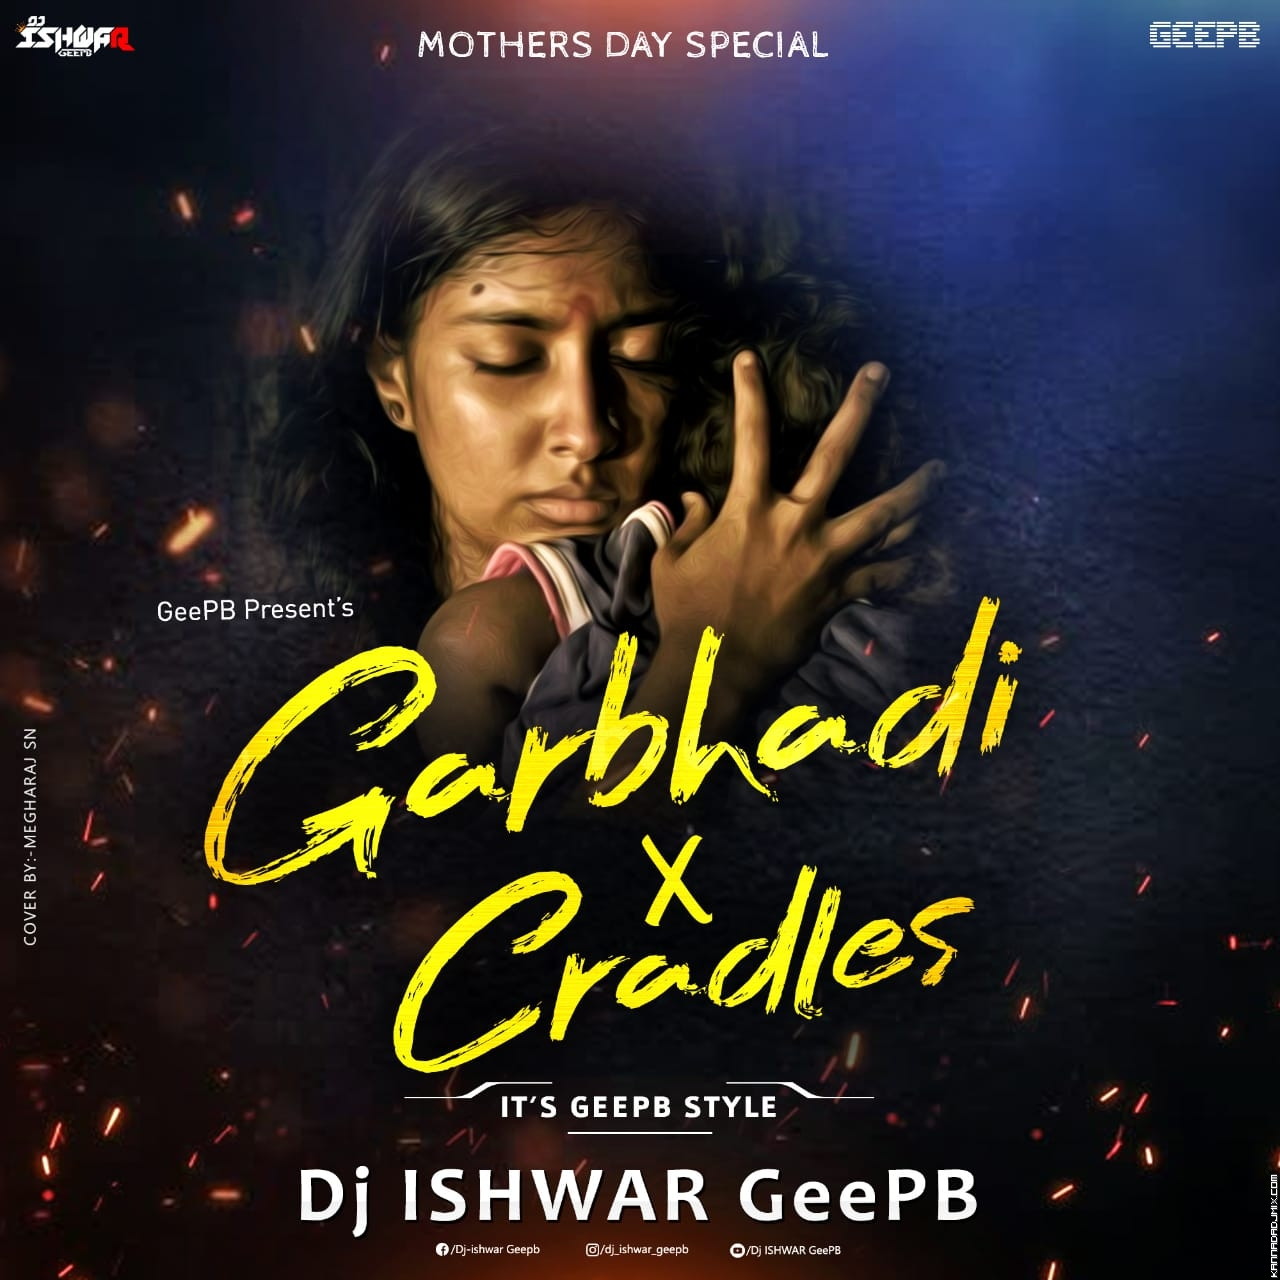 01_GHARBADHI_x_CRADLES_x_DJ_ISHWAR_GeePB.mp3